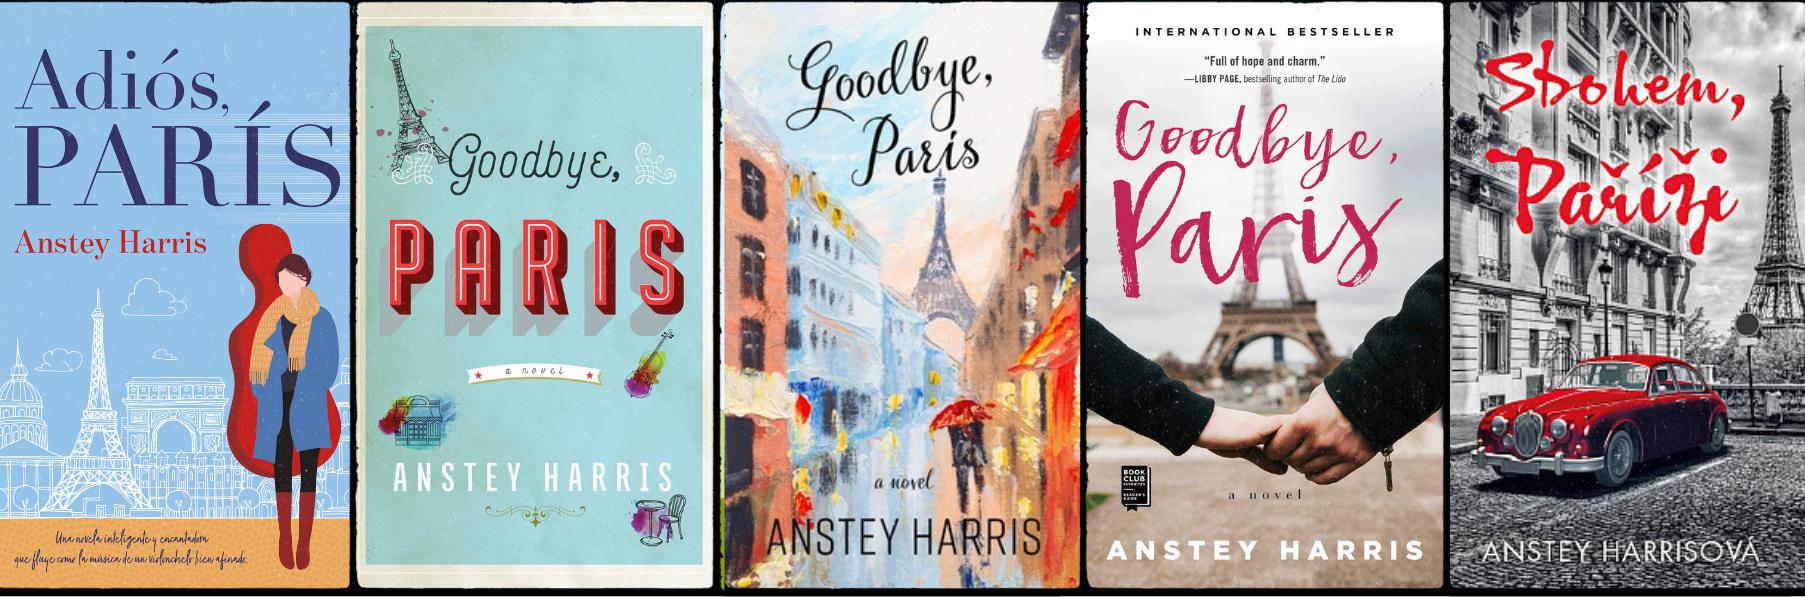 Anstey Harris Goodbye Paris